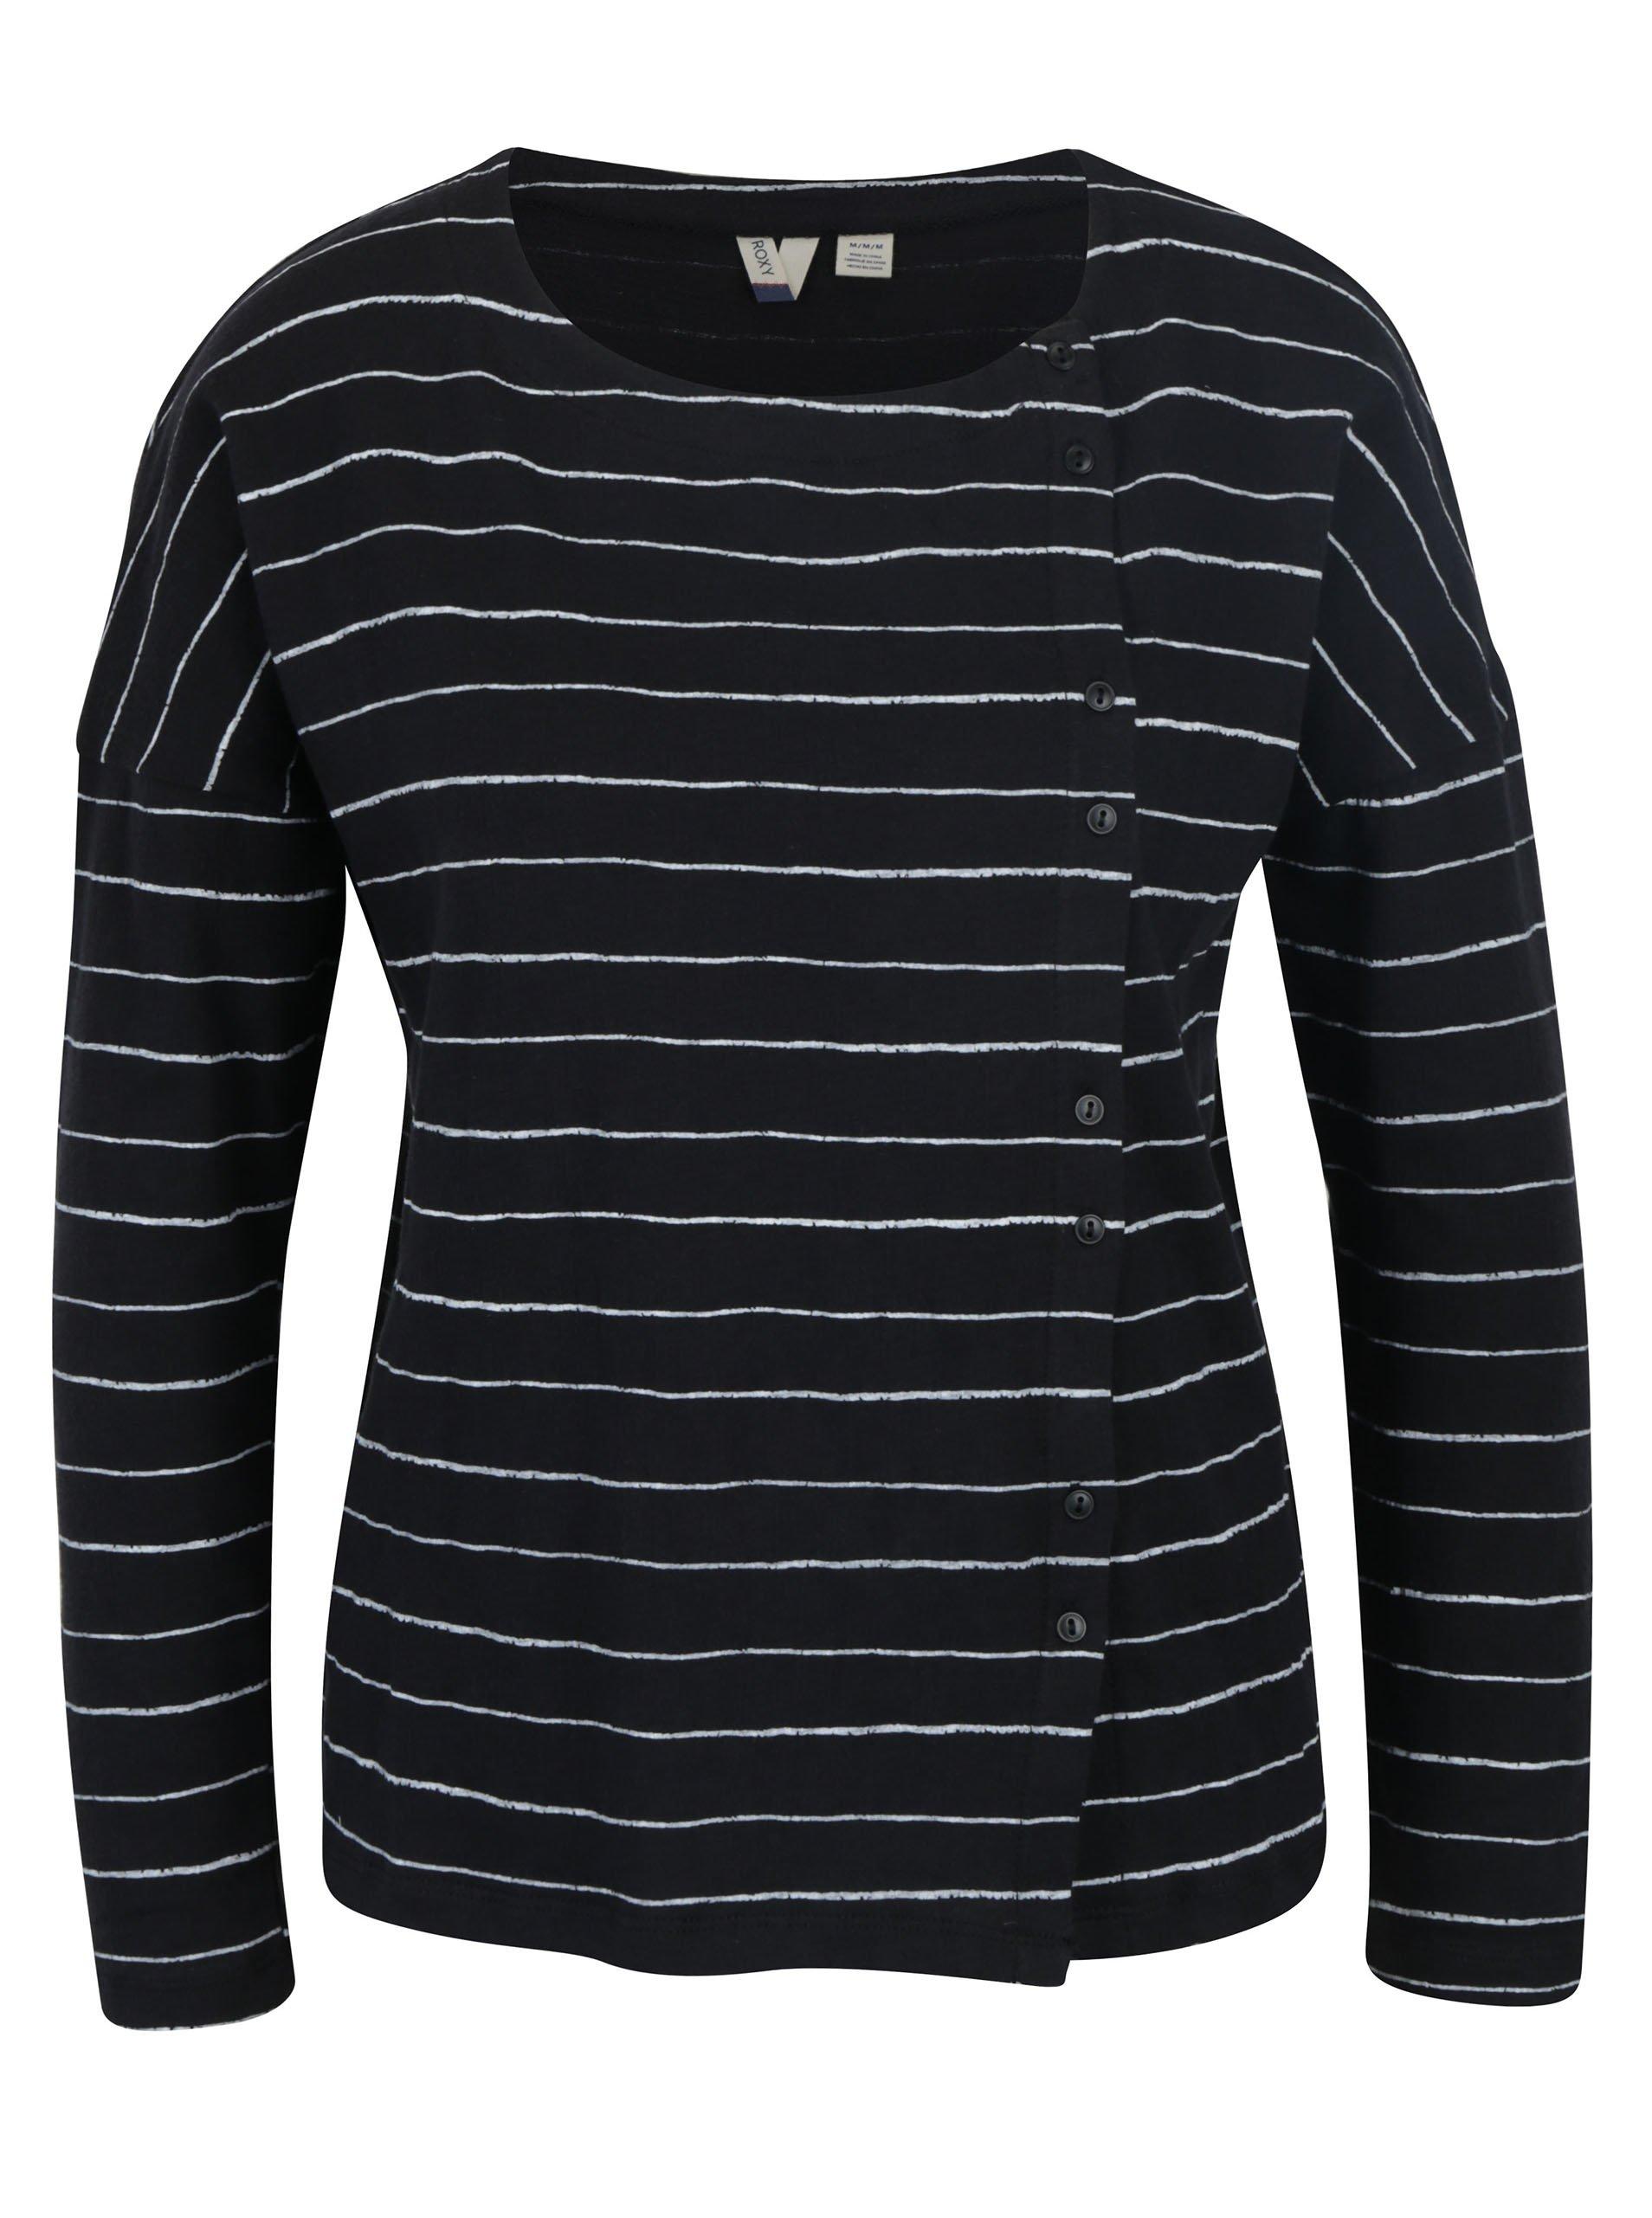 Černo-bílé dámské pruhované tričko Roxy Dream Taste